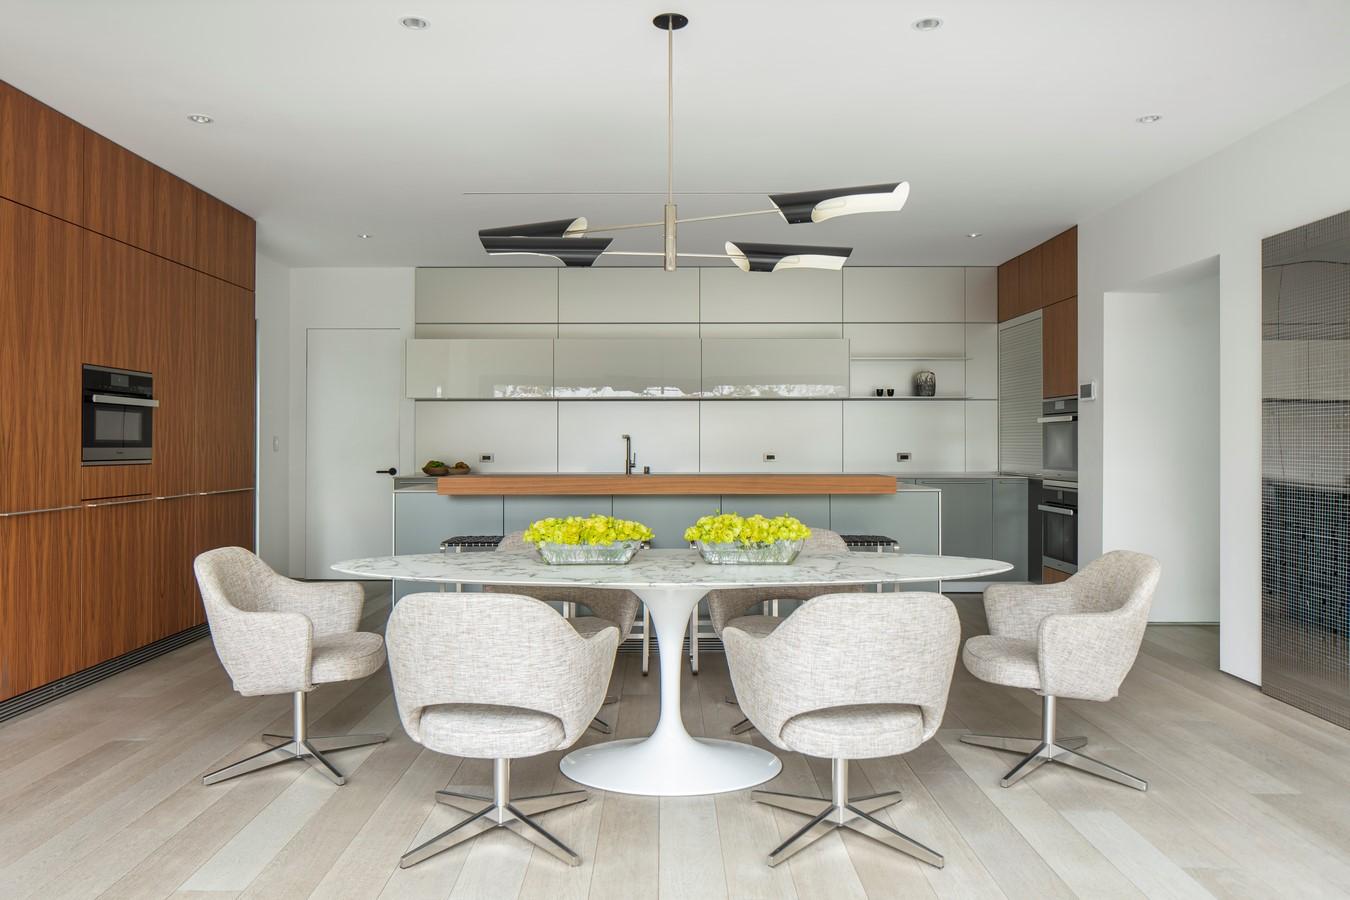 Lush Beverly Hills Bungalow By Magni Kalman Design - Sheet2